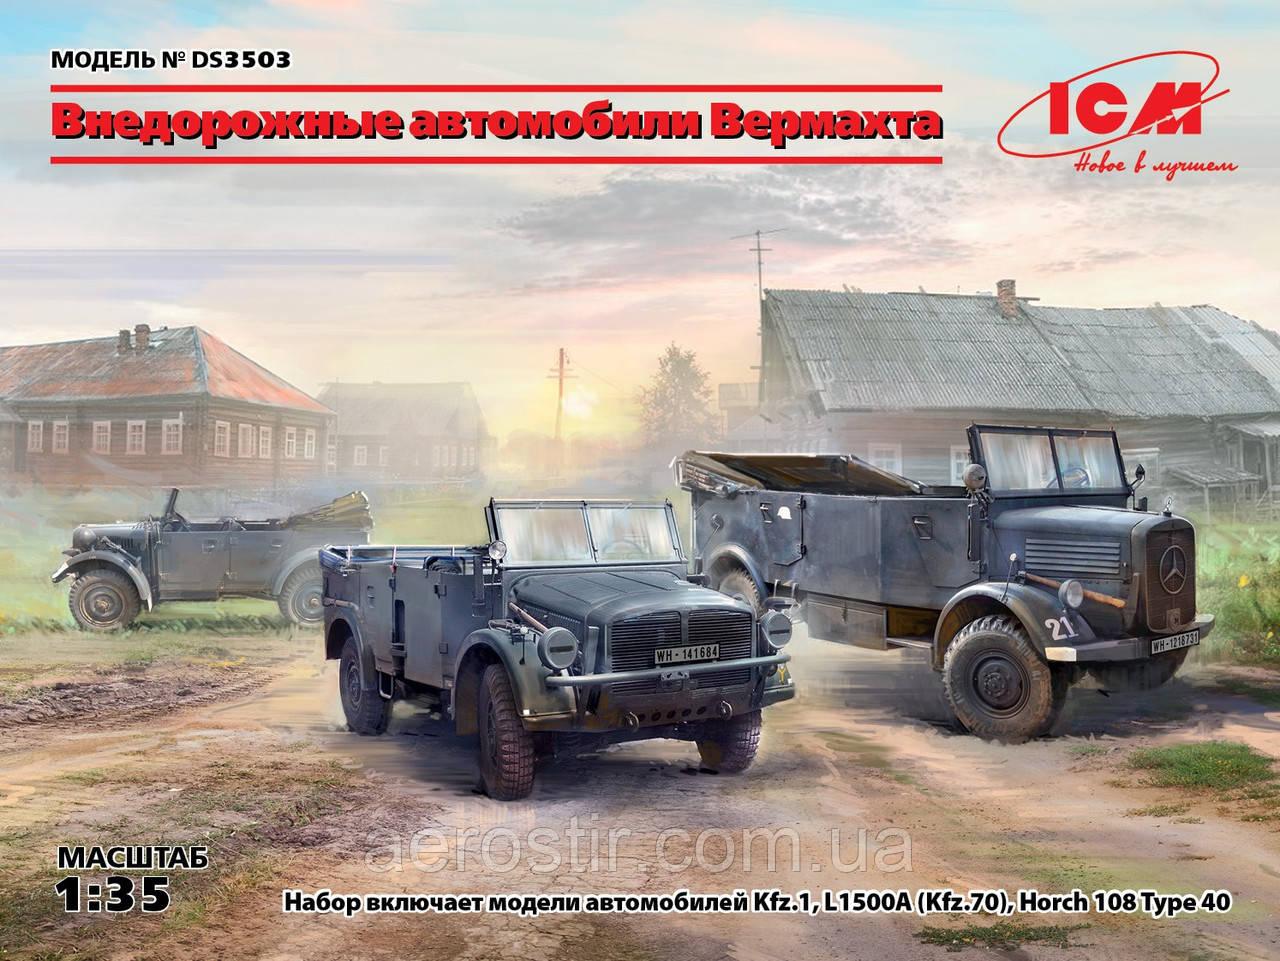 Автомобили Вермахта (Kfz.1, Horch 108 Typ 40, L1500A) 1/35 ICM DS3503